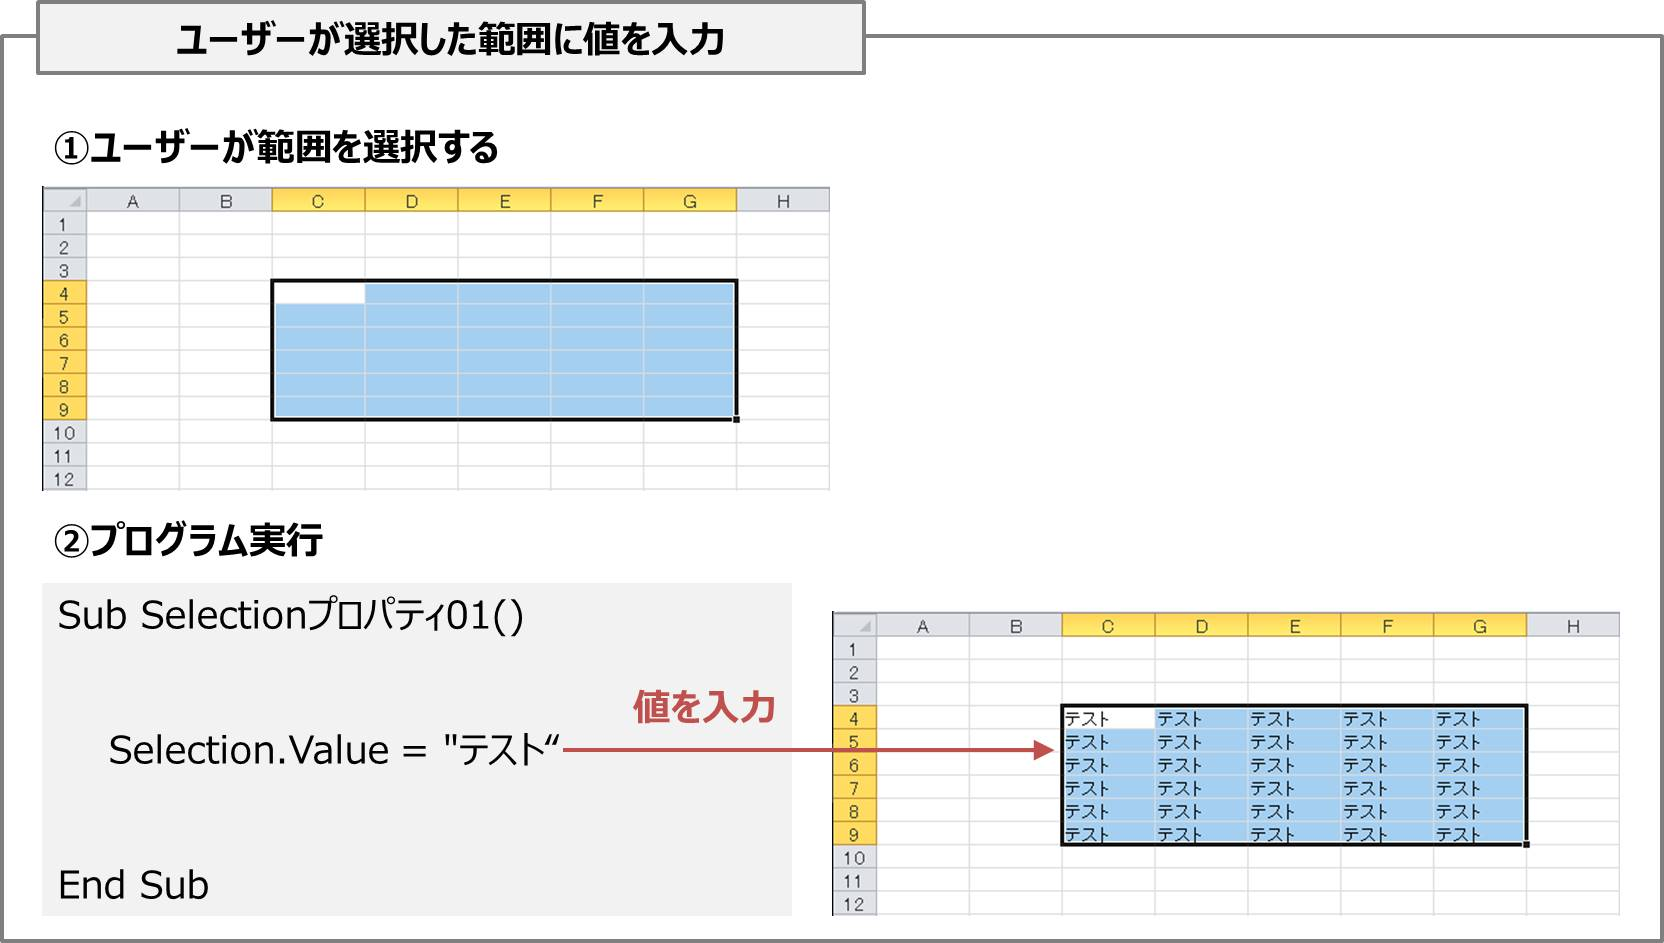 【VBA】【Selectionプロパティ】ユーザーが選択した範囲に値を入力